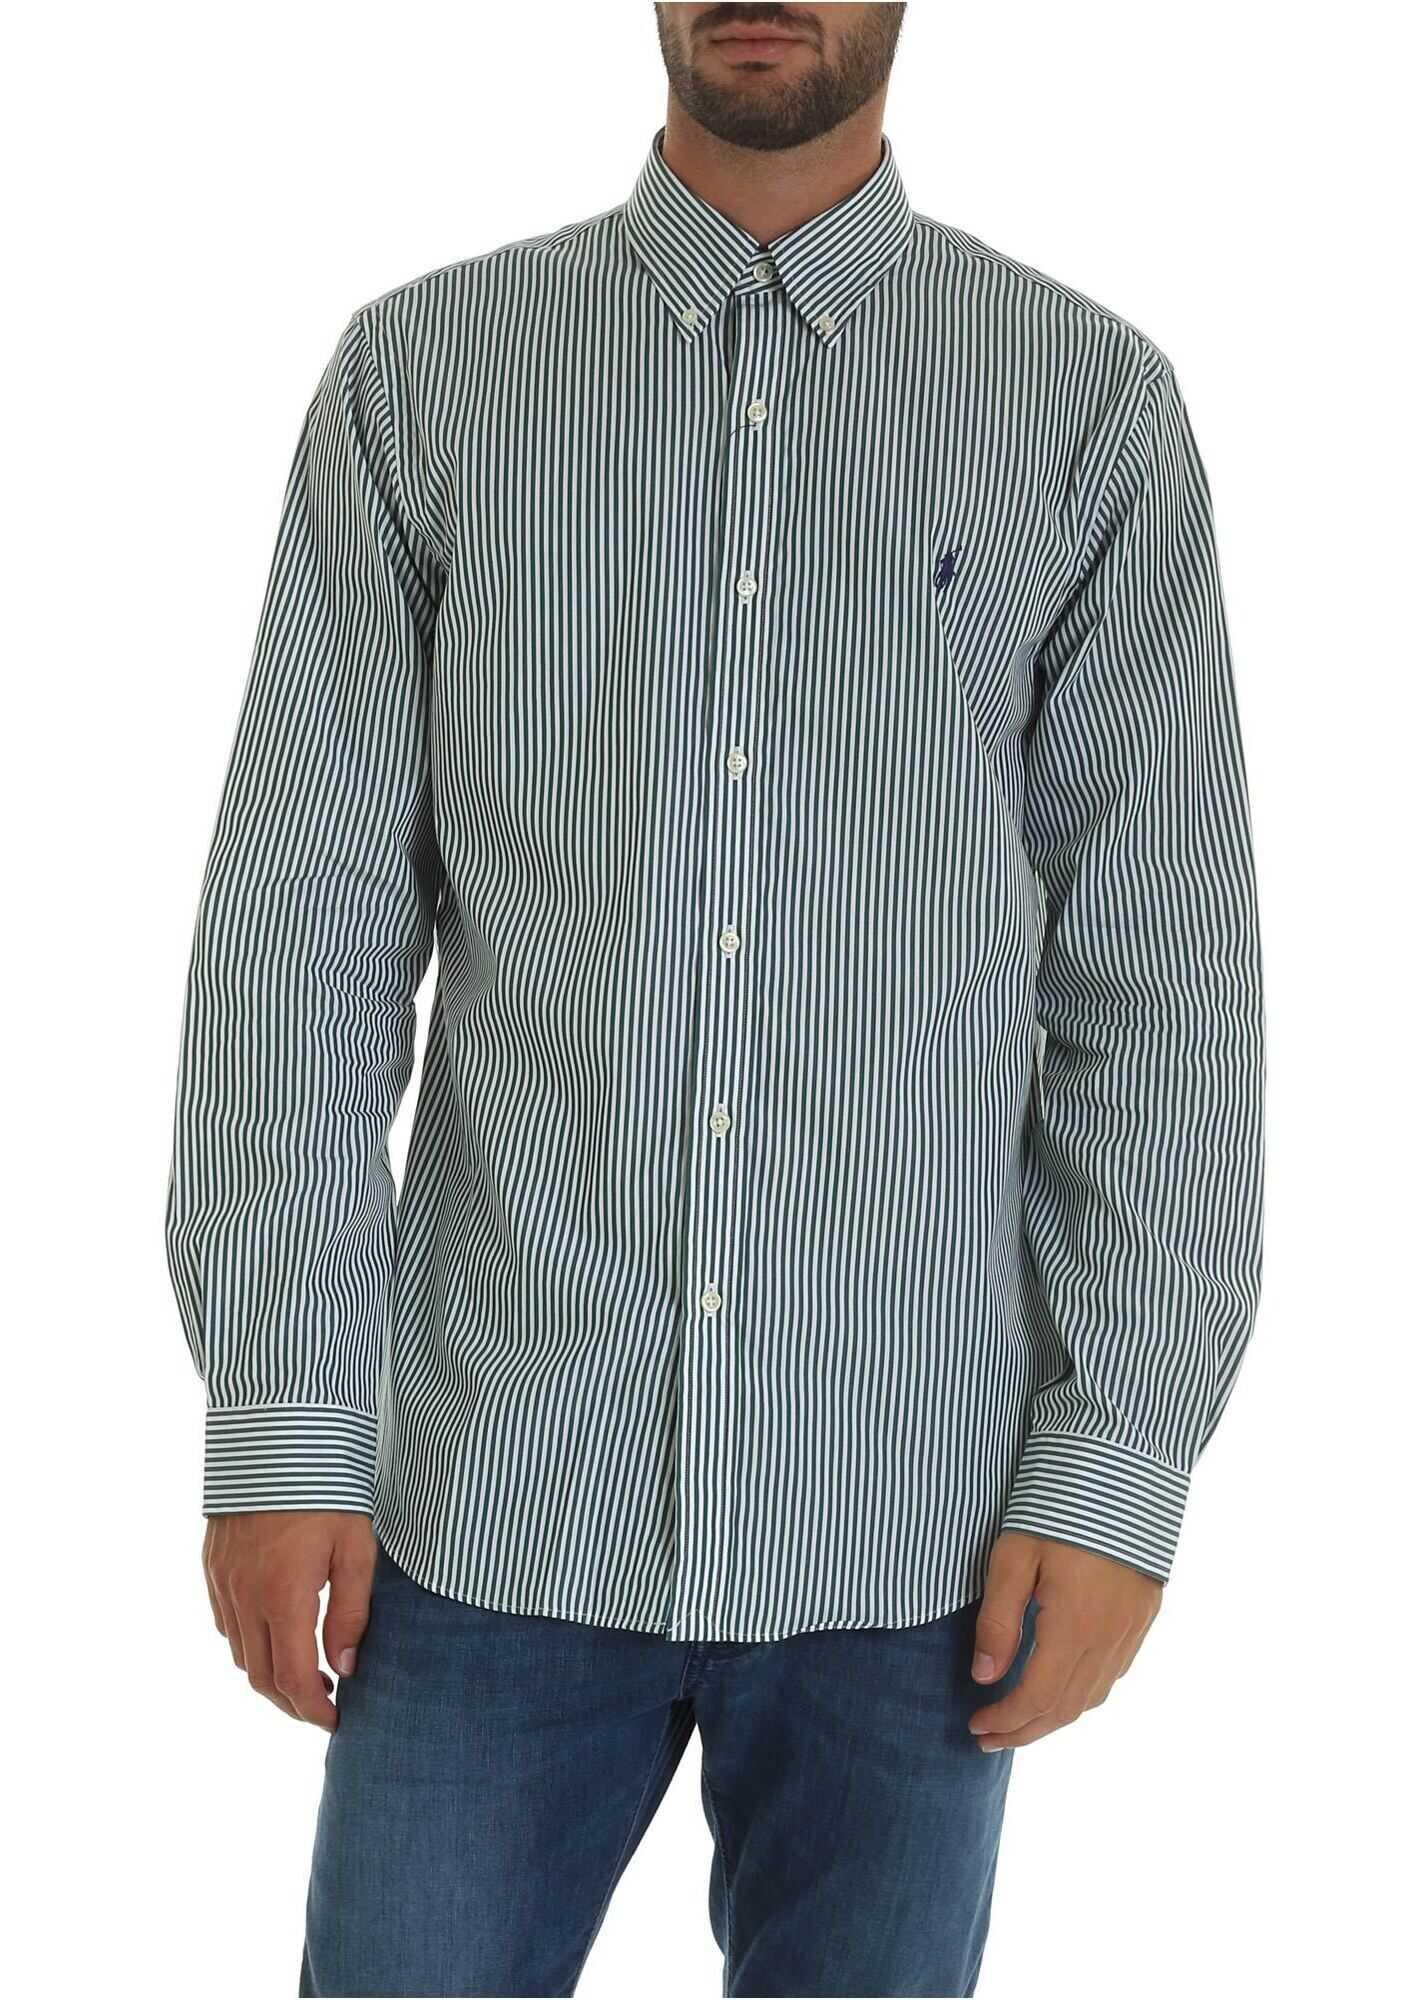 Ralph Lauren White Shirt With Green Stripes Green imagine